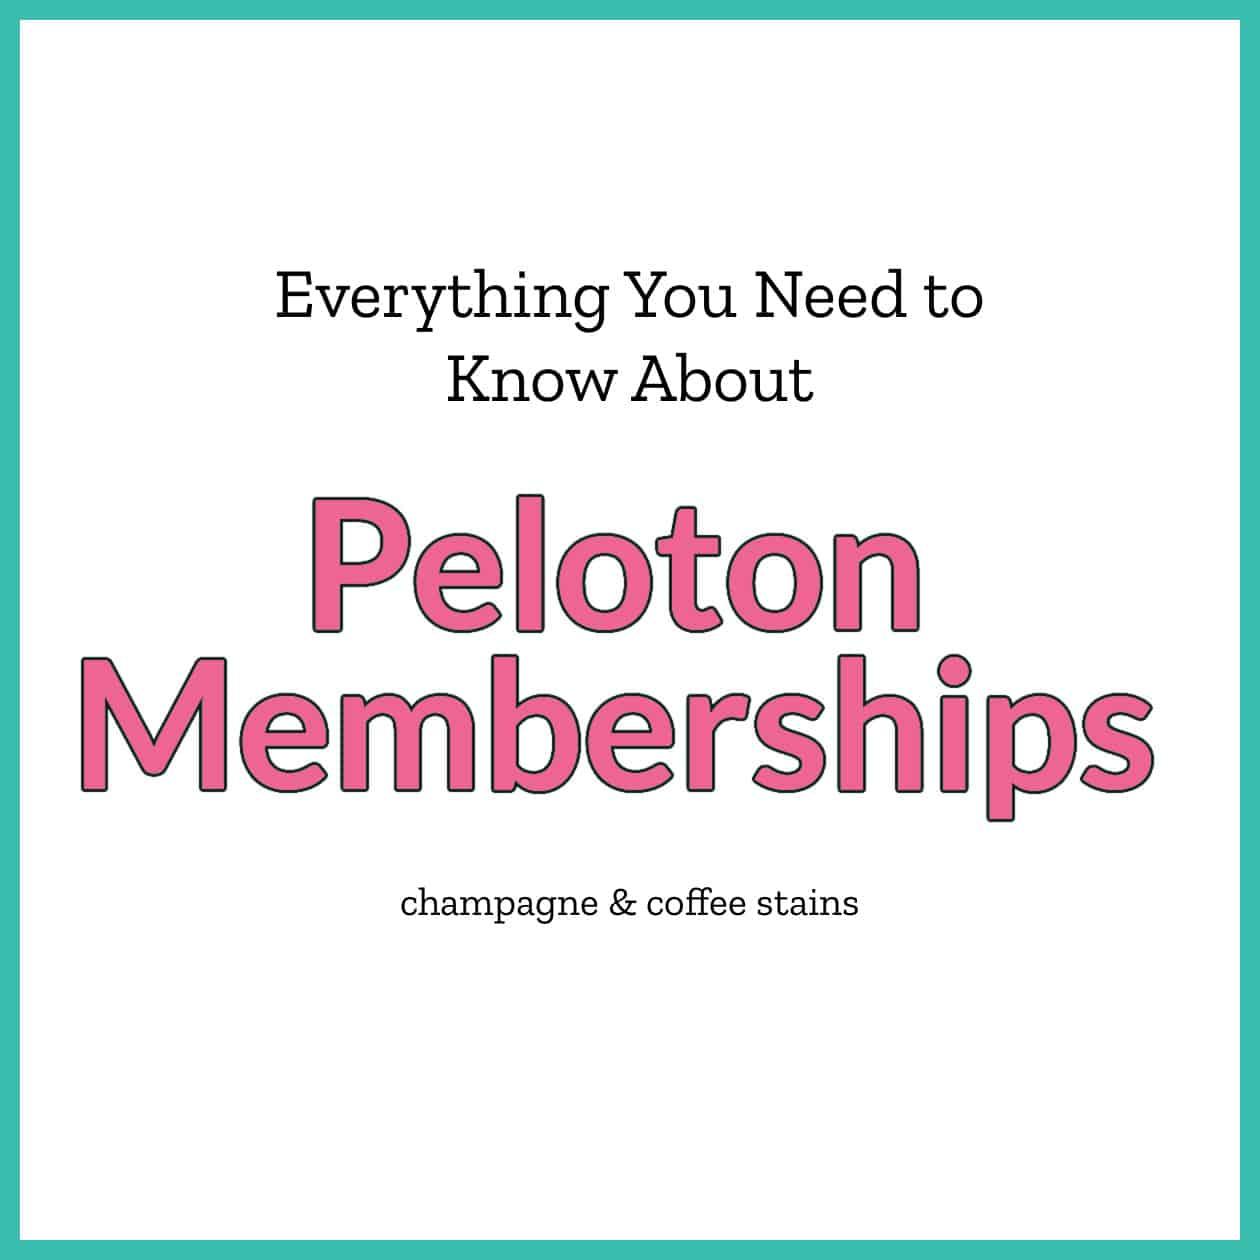 peloton memberships blog image copy